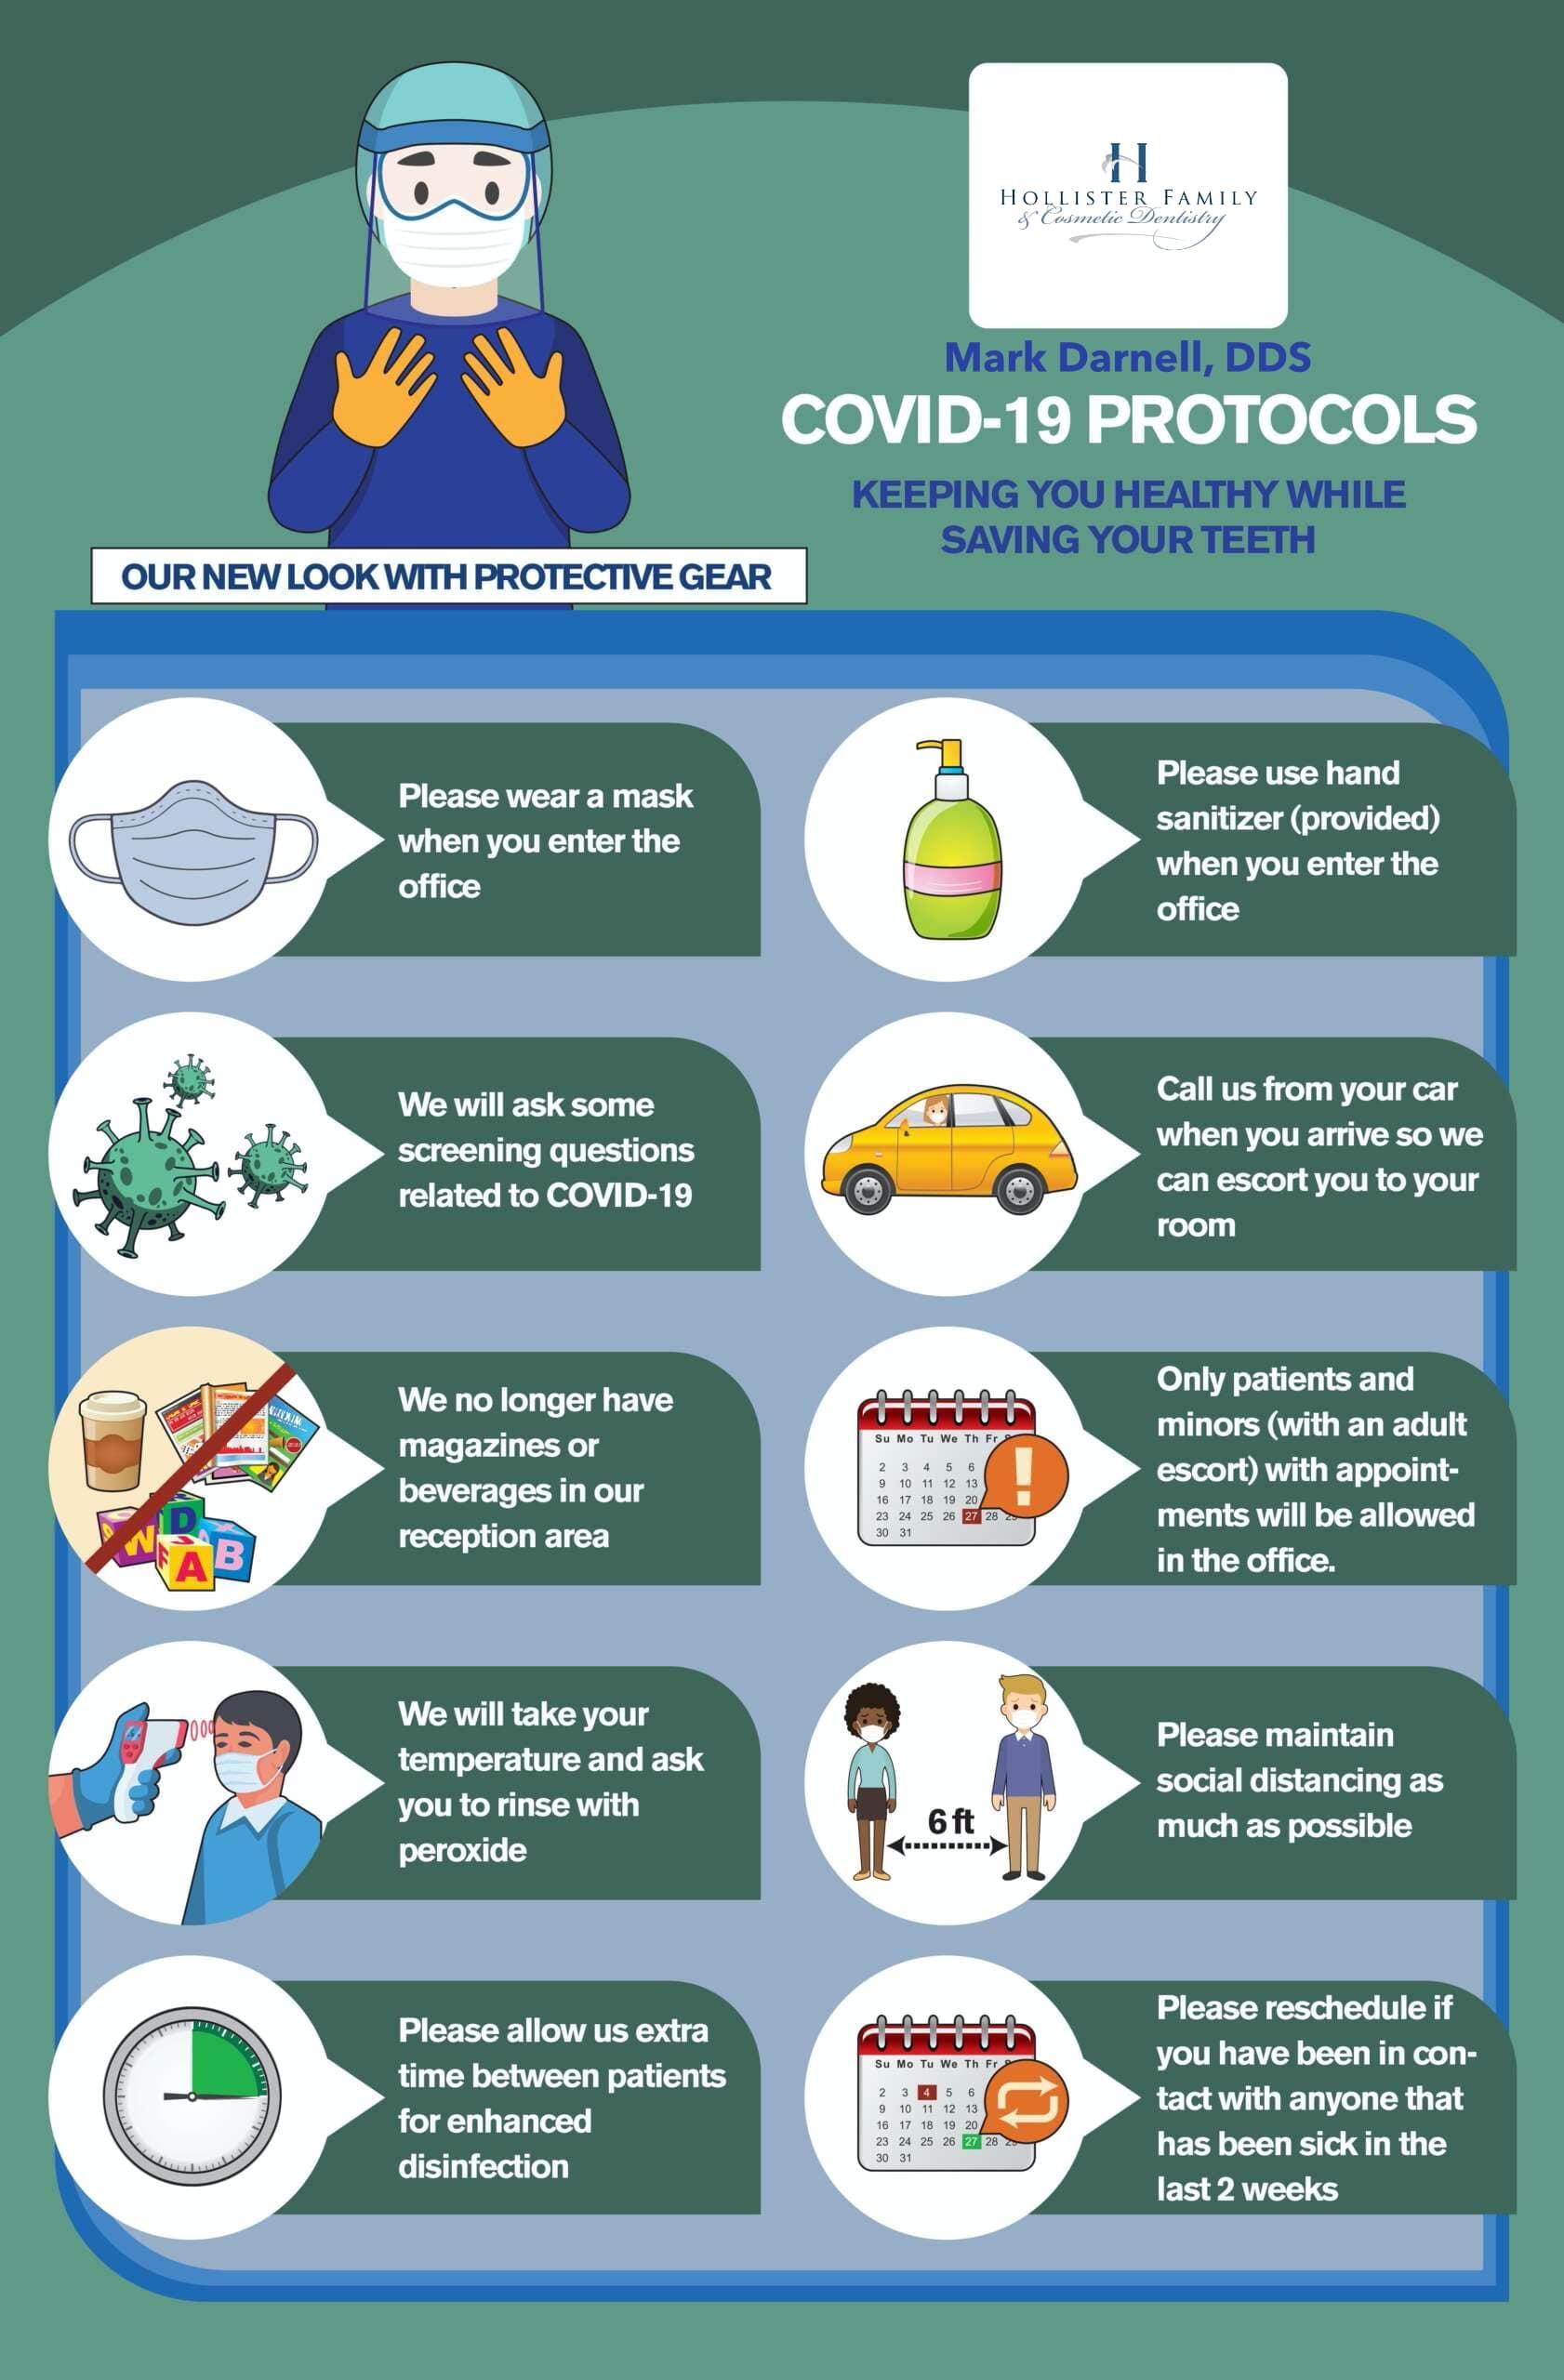 COVID-19 protocols and list of precautions dentist in Hollister, CA